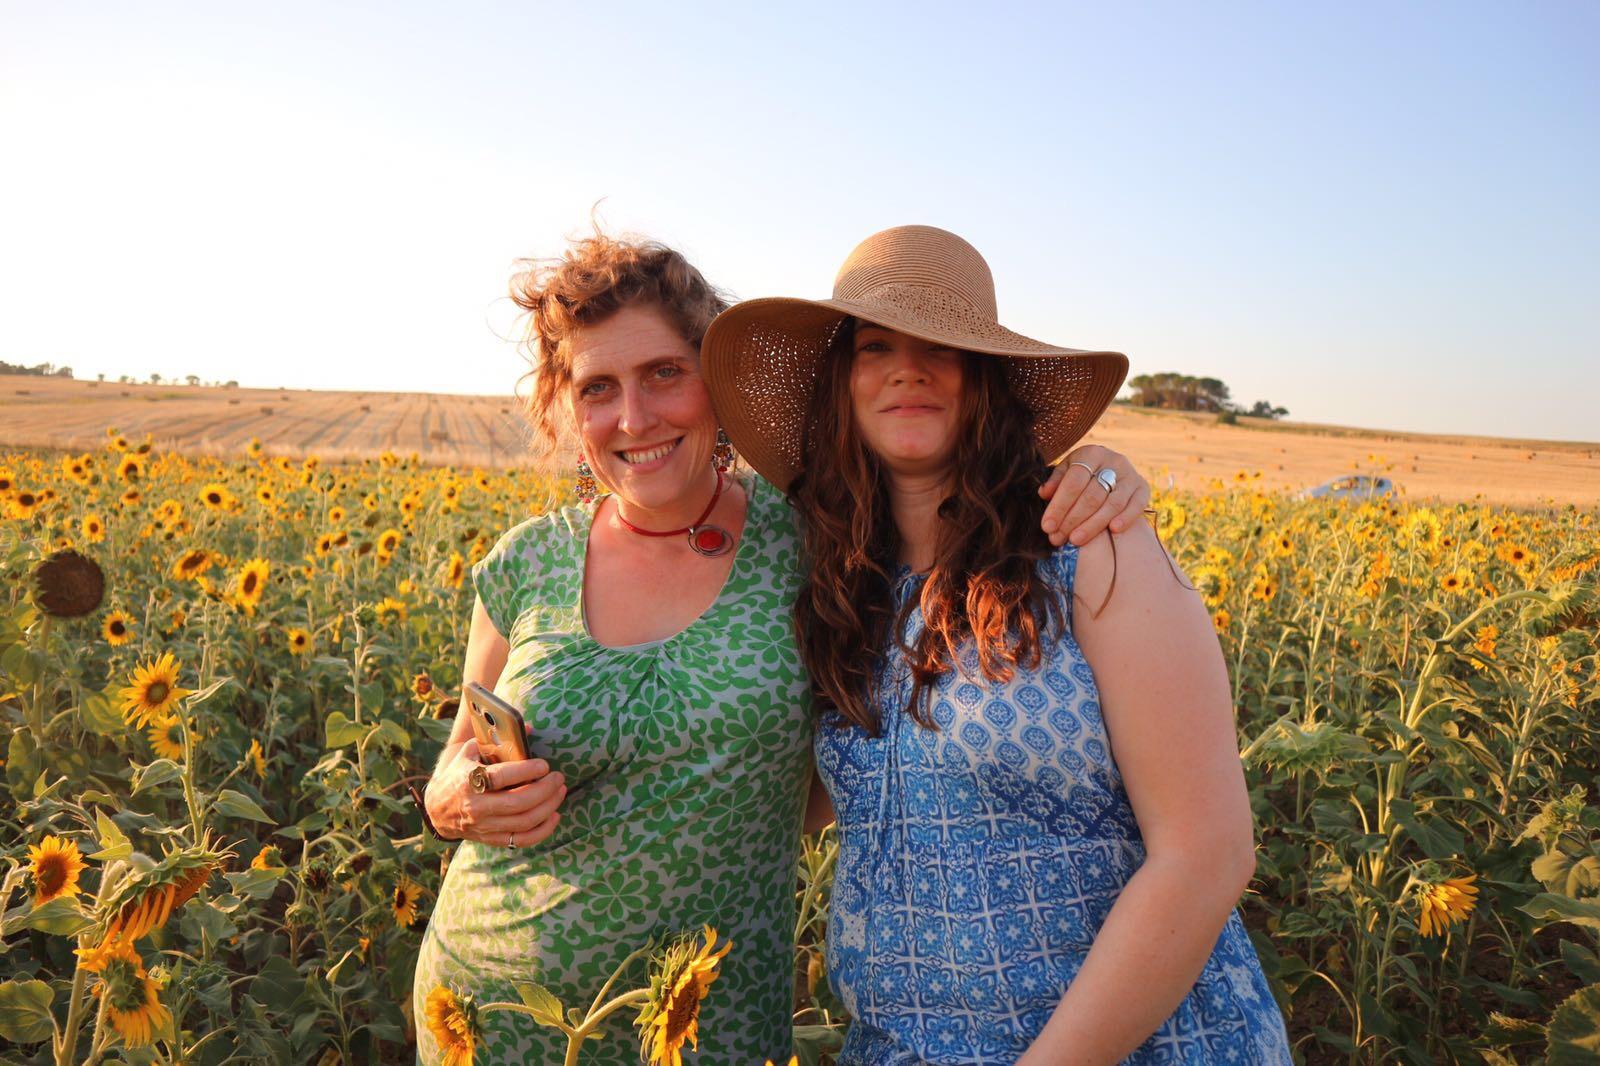 friends in the flowers | EAT.PRAY.MOVE Yoga Retreats | Tuscany, Italy